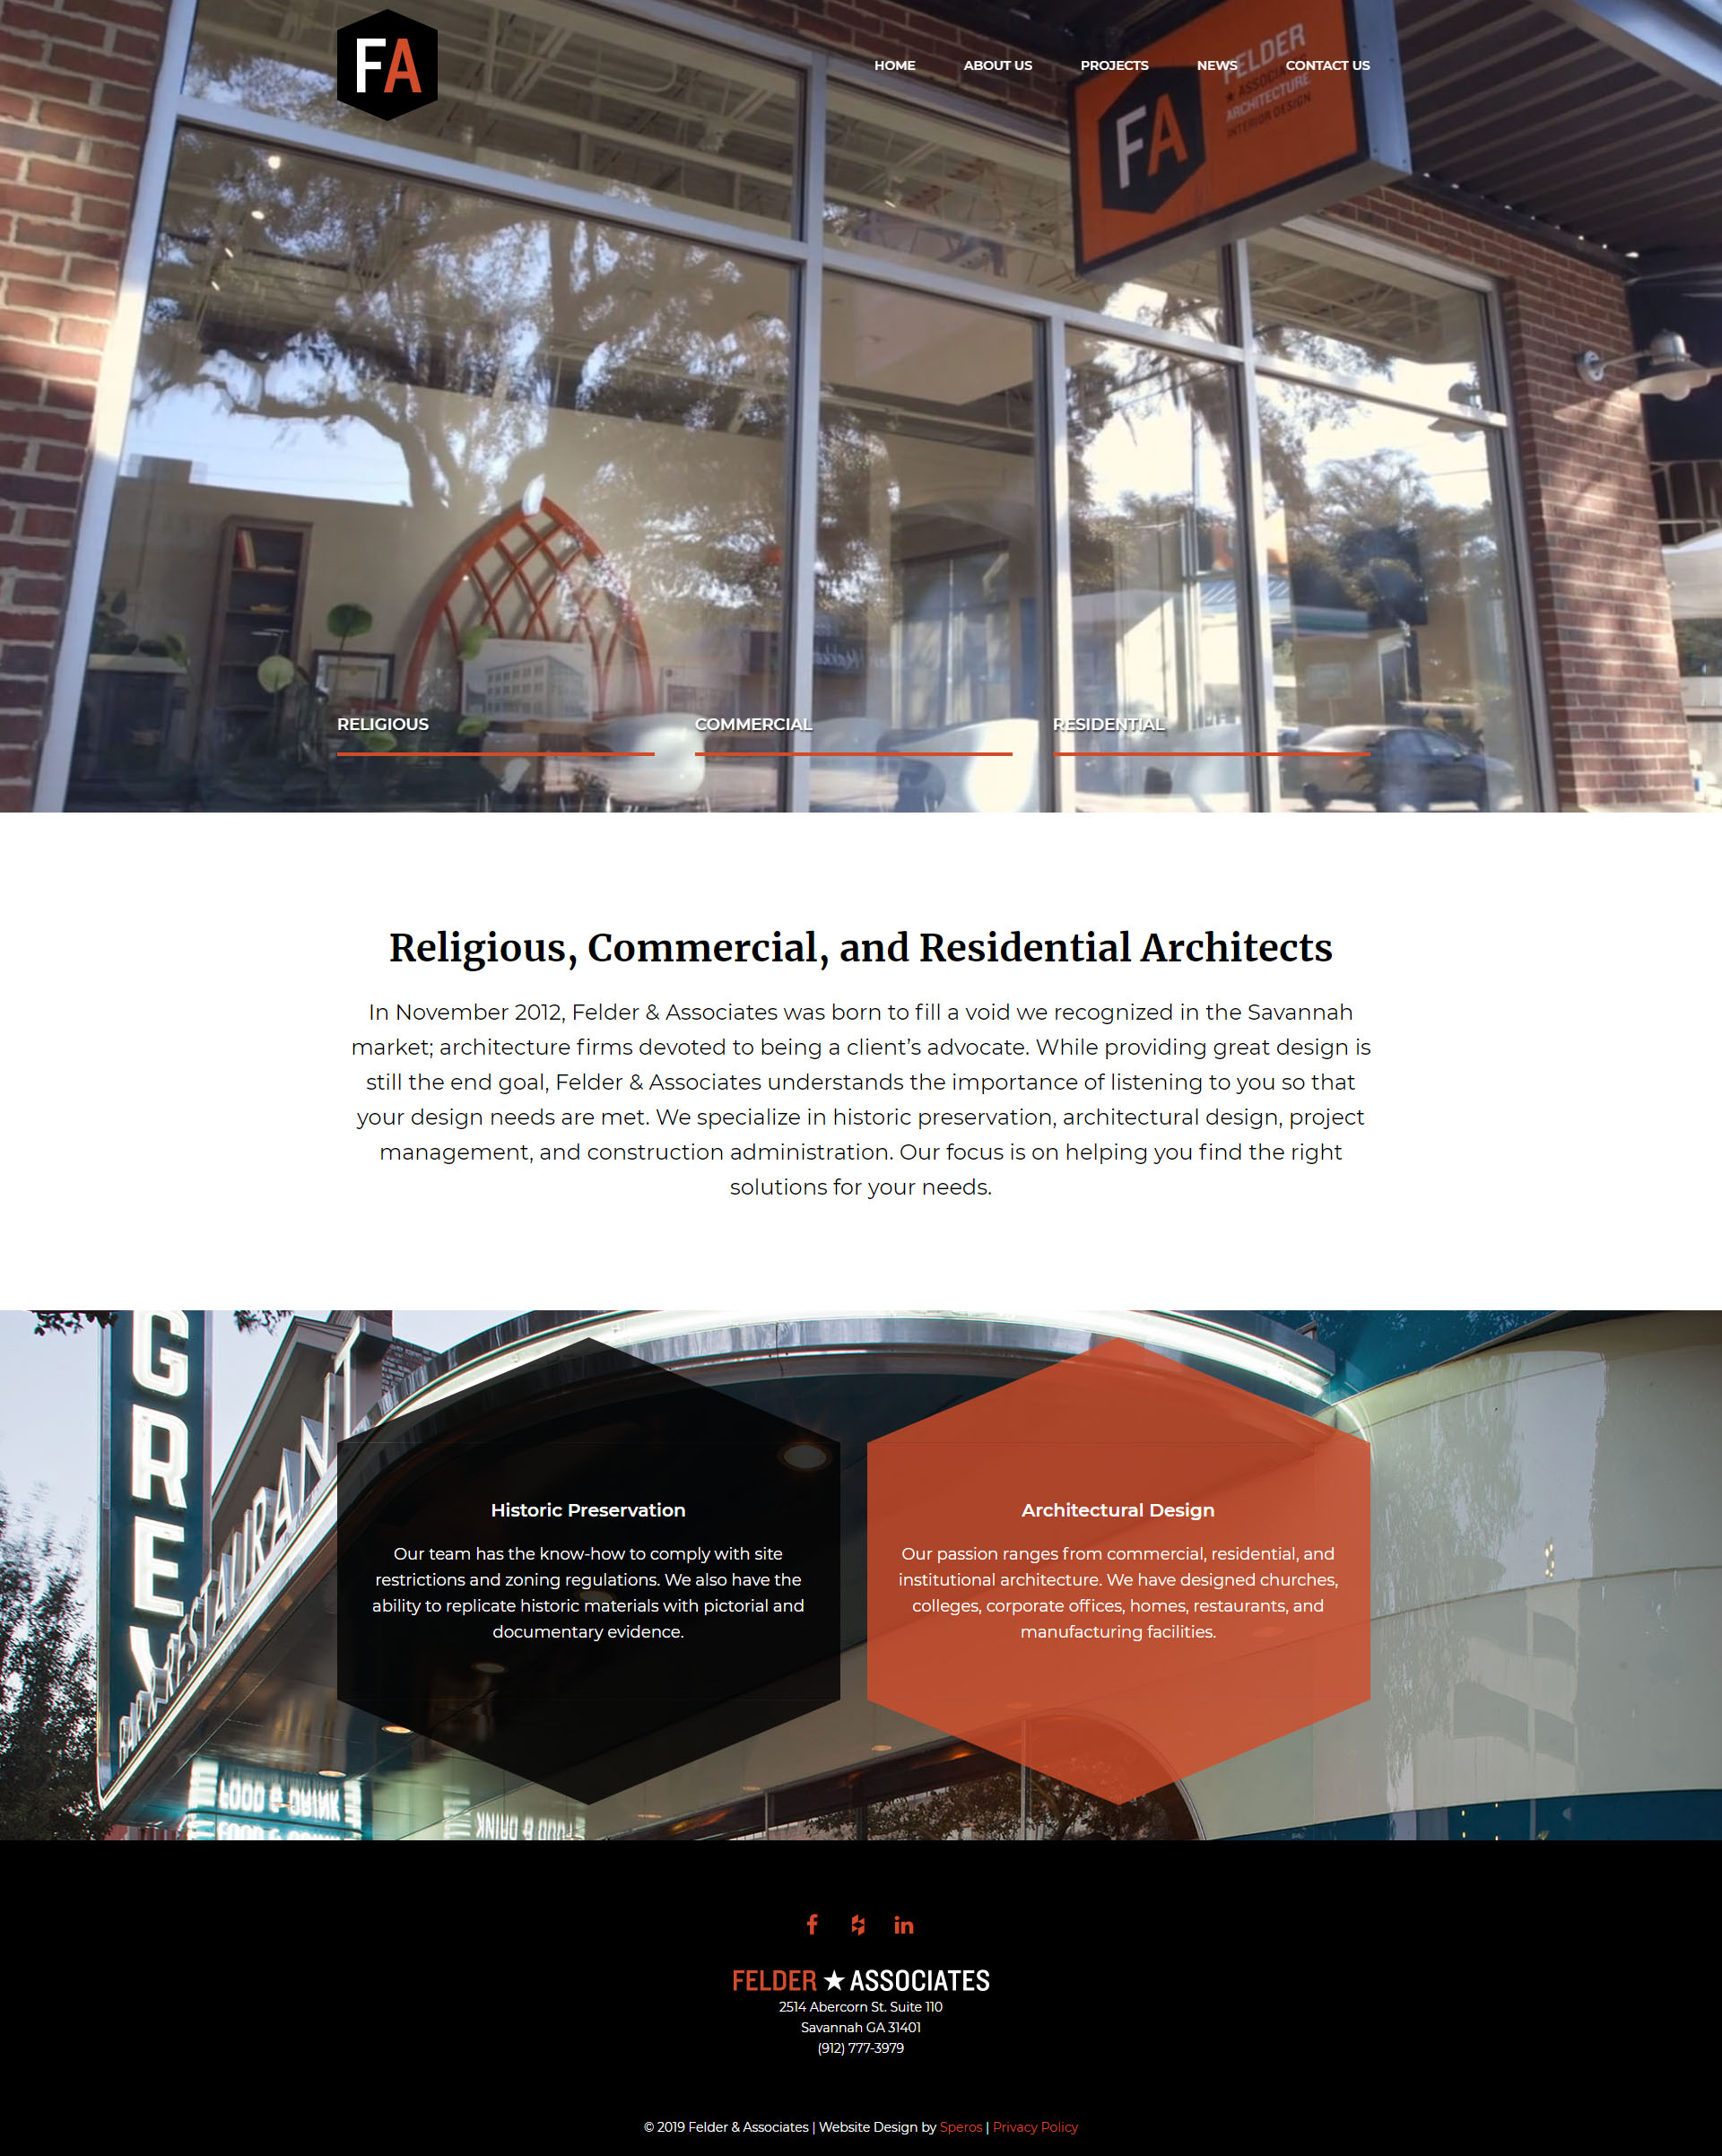 Felder and Associates website homepage design - Speros - Savannah, GA